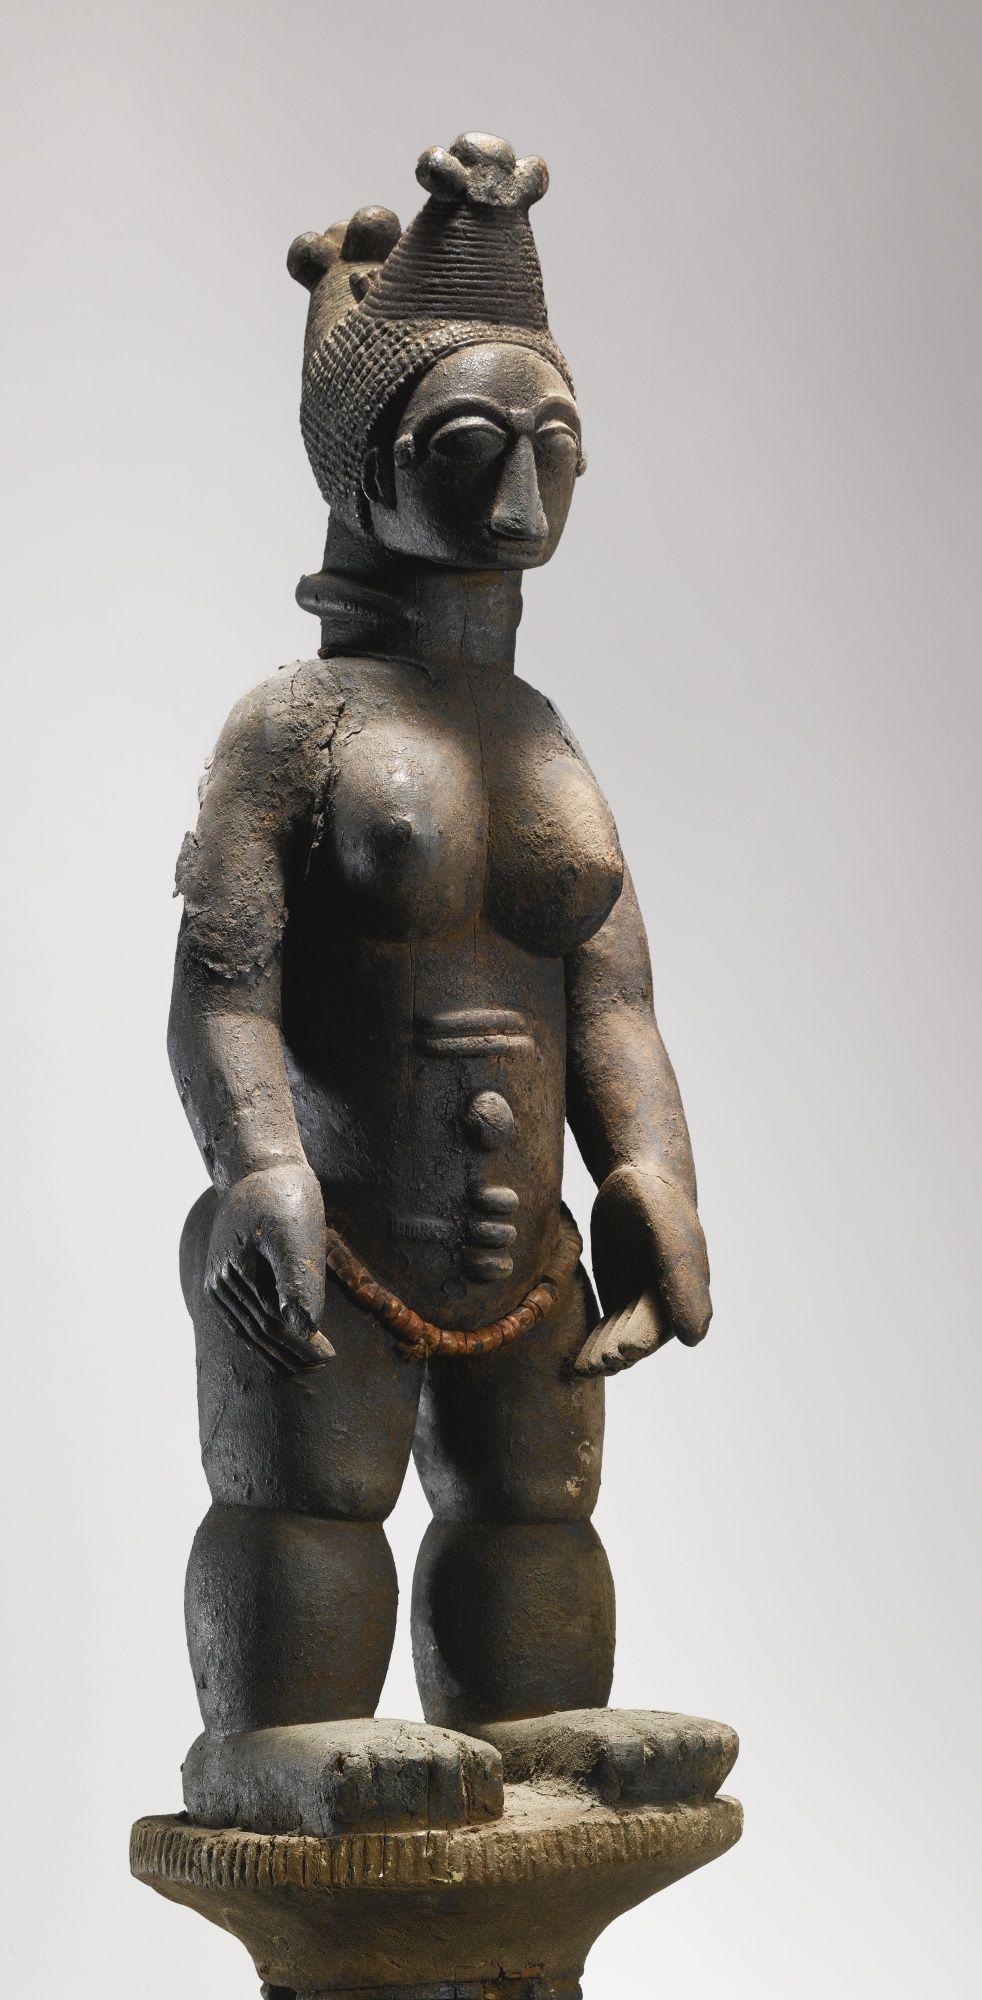 Http Www Sothebys Com Sothebys 2013 C 2018 Sotheby S Merton D Simpson New York 1970s Or 1980s Allan Stone New Yor African Sculptures Ivory Coast Africa